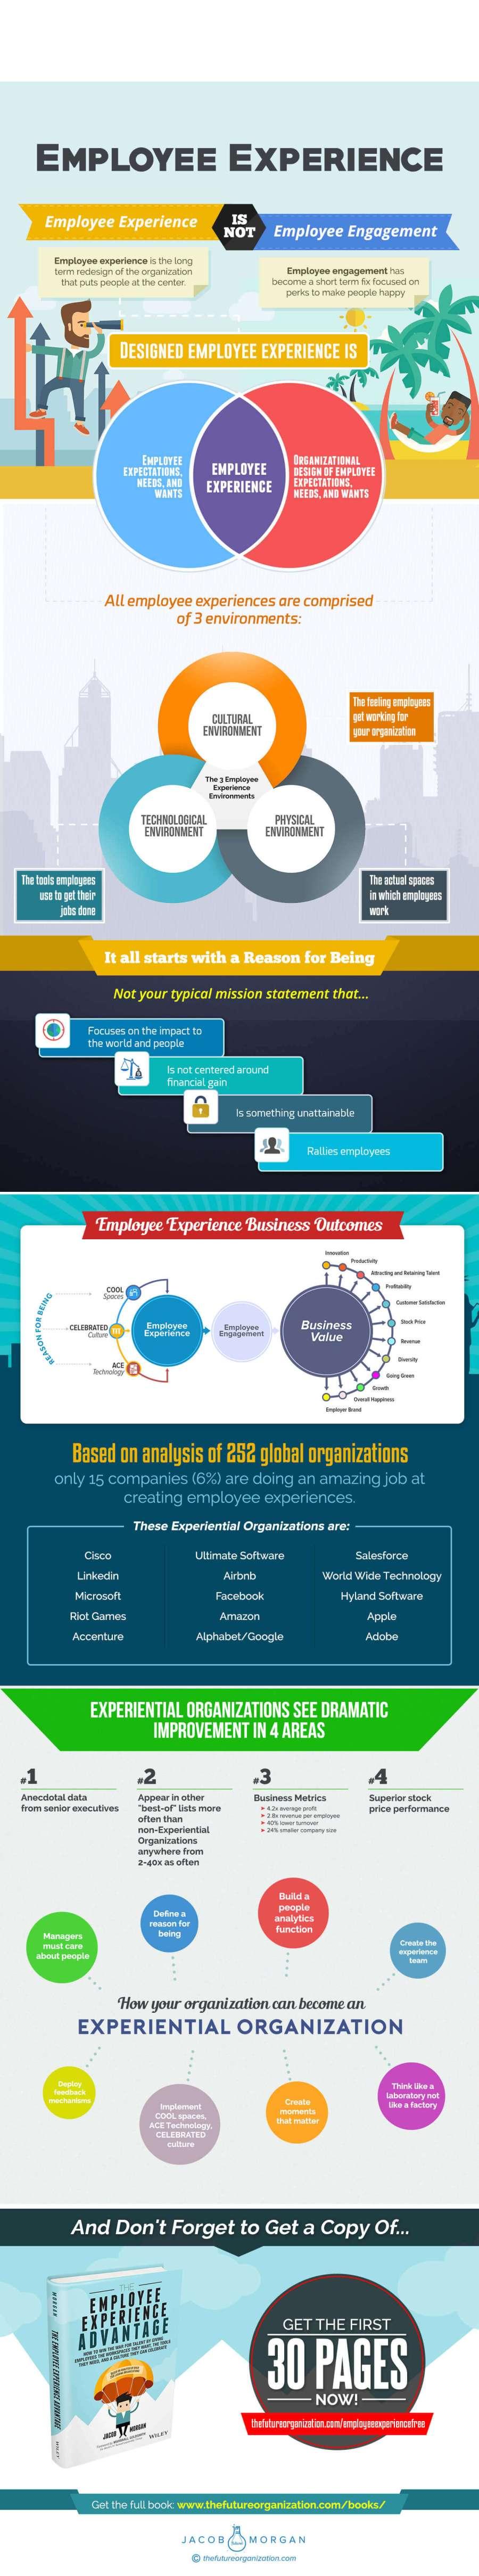 Employee experience infographic